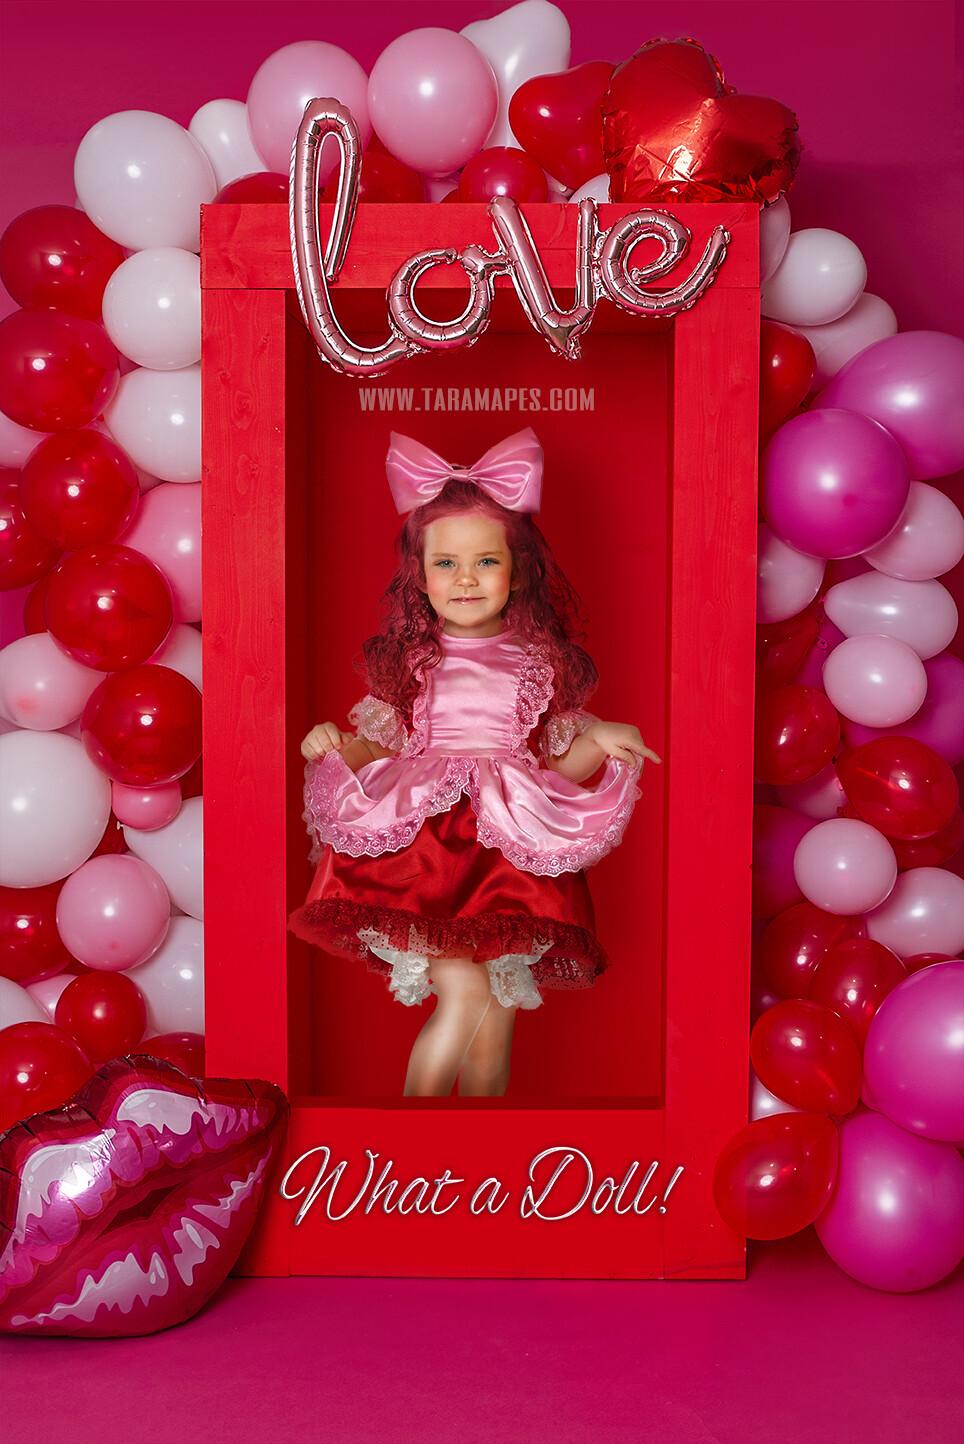 Valentine Doll Box- Valentine Balloons and Box Digital LAYERED PSD - Child Couples Love Anniversary Valentine's Day Digital Background / Backdrop